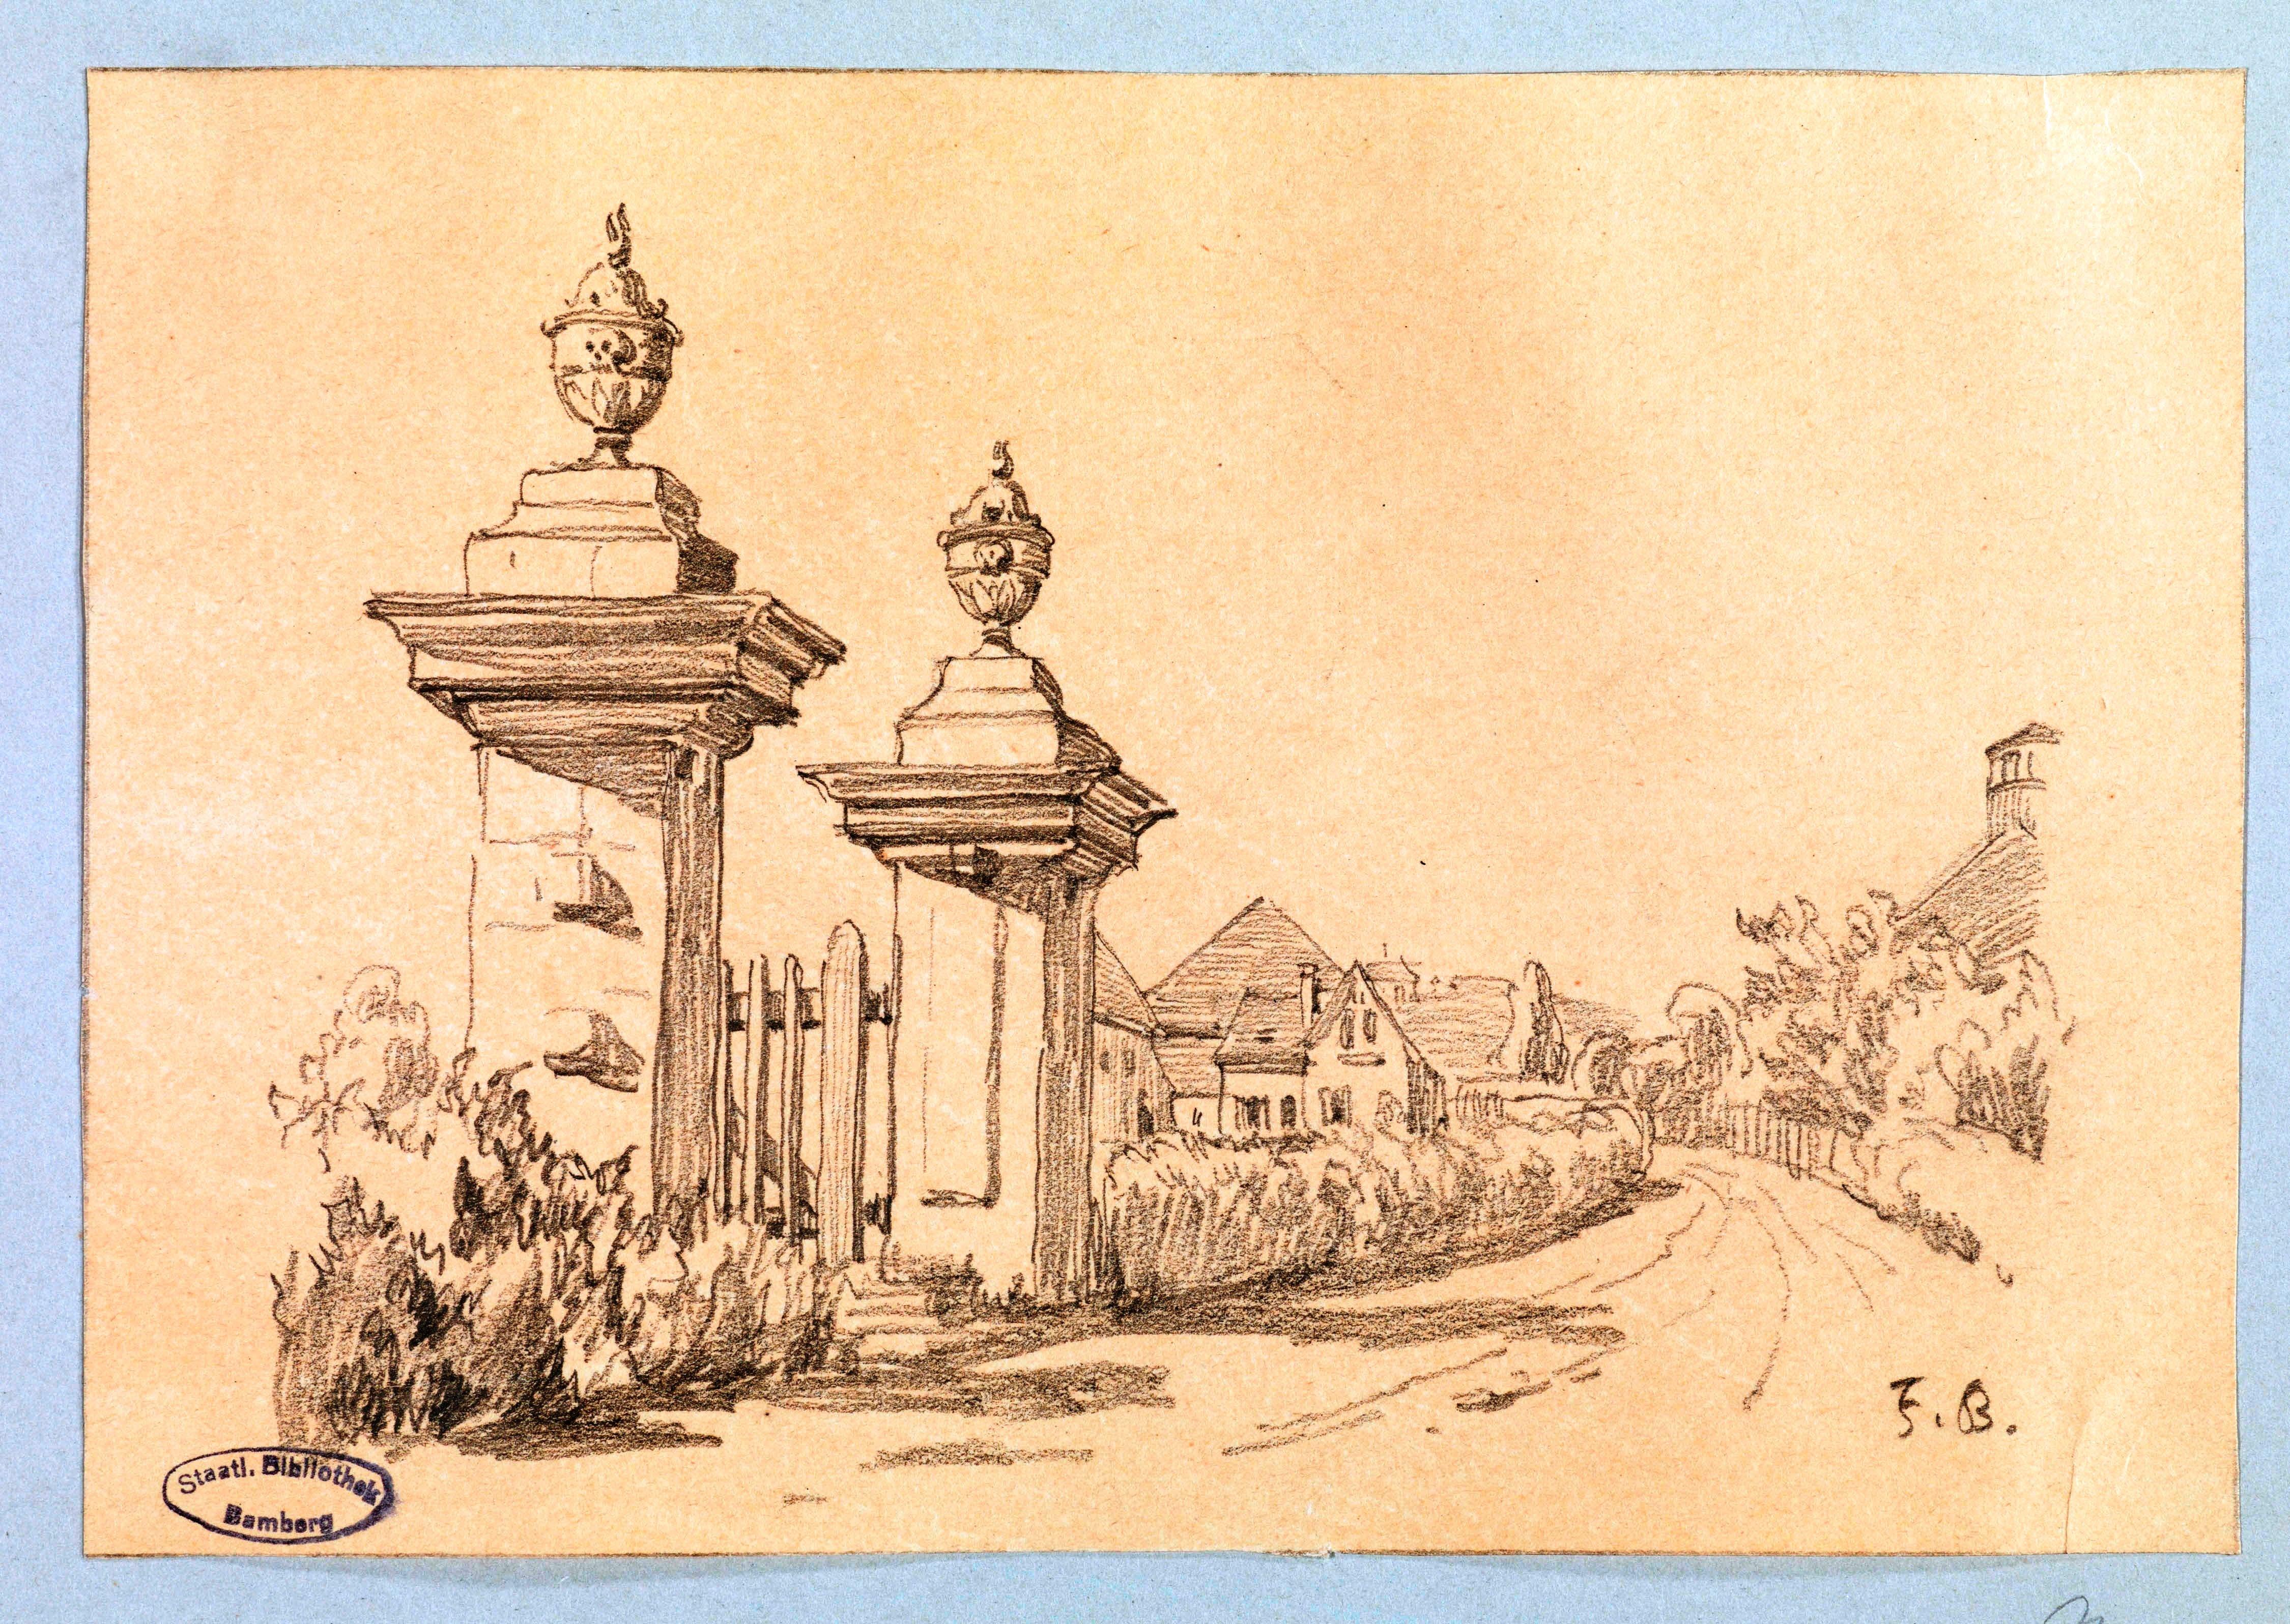 Friedhof bamberg öffnungszeiten